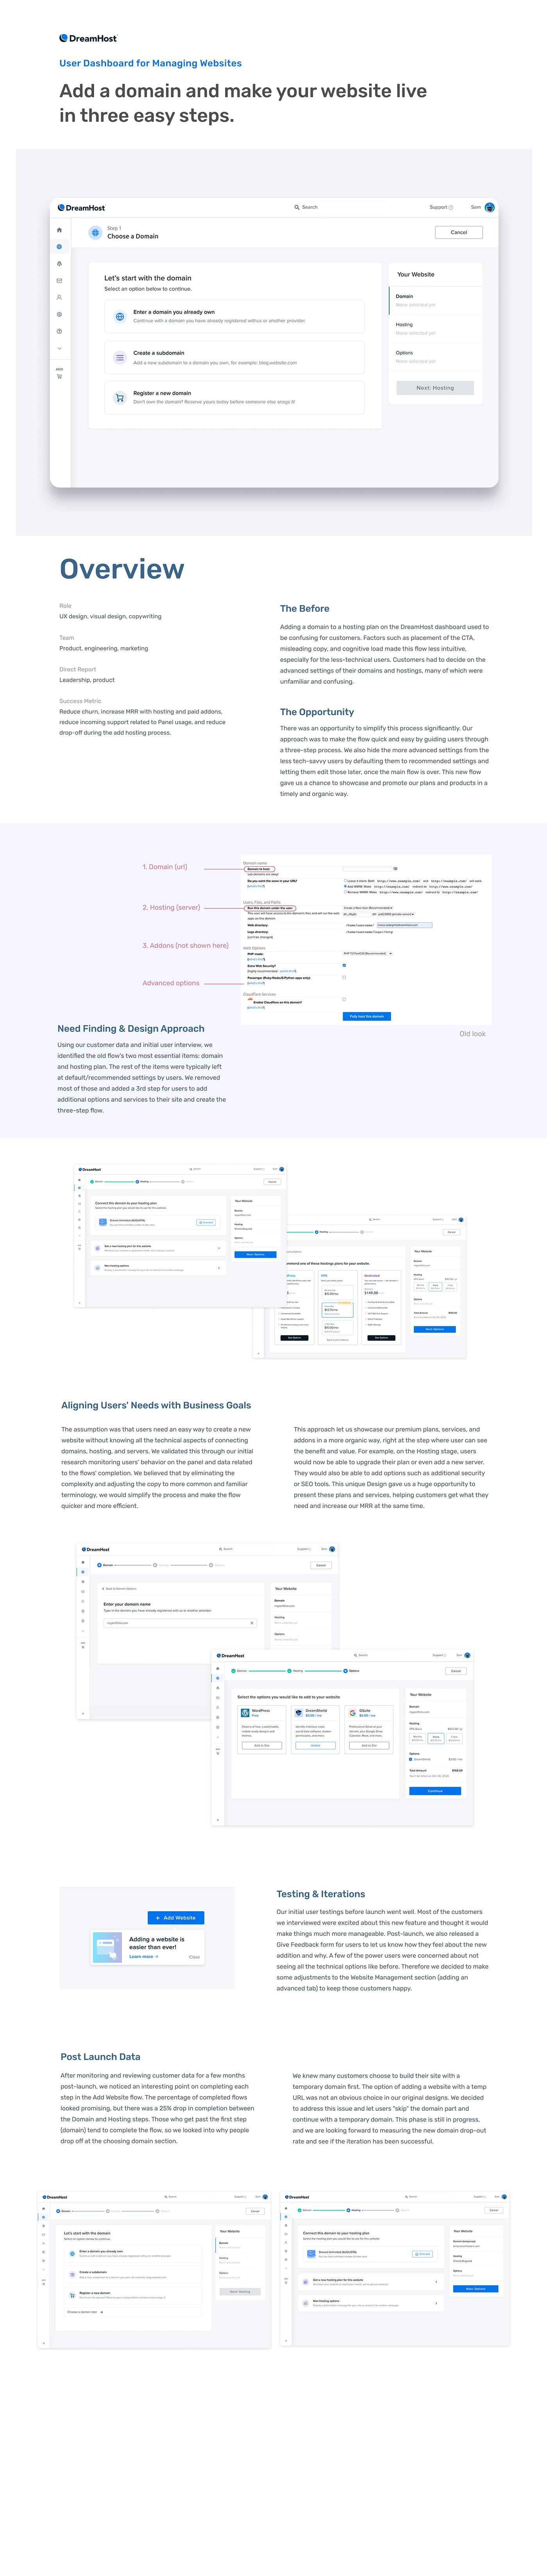 dashboard product design  User Panel UX design